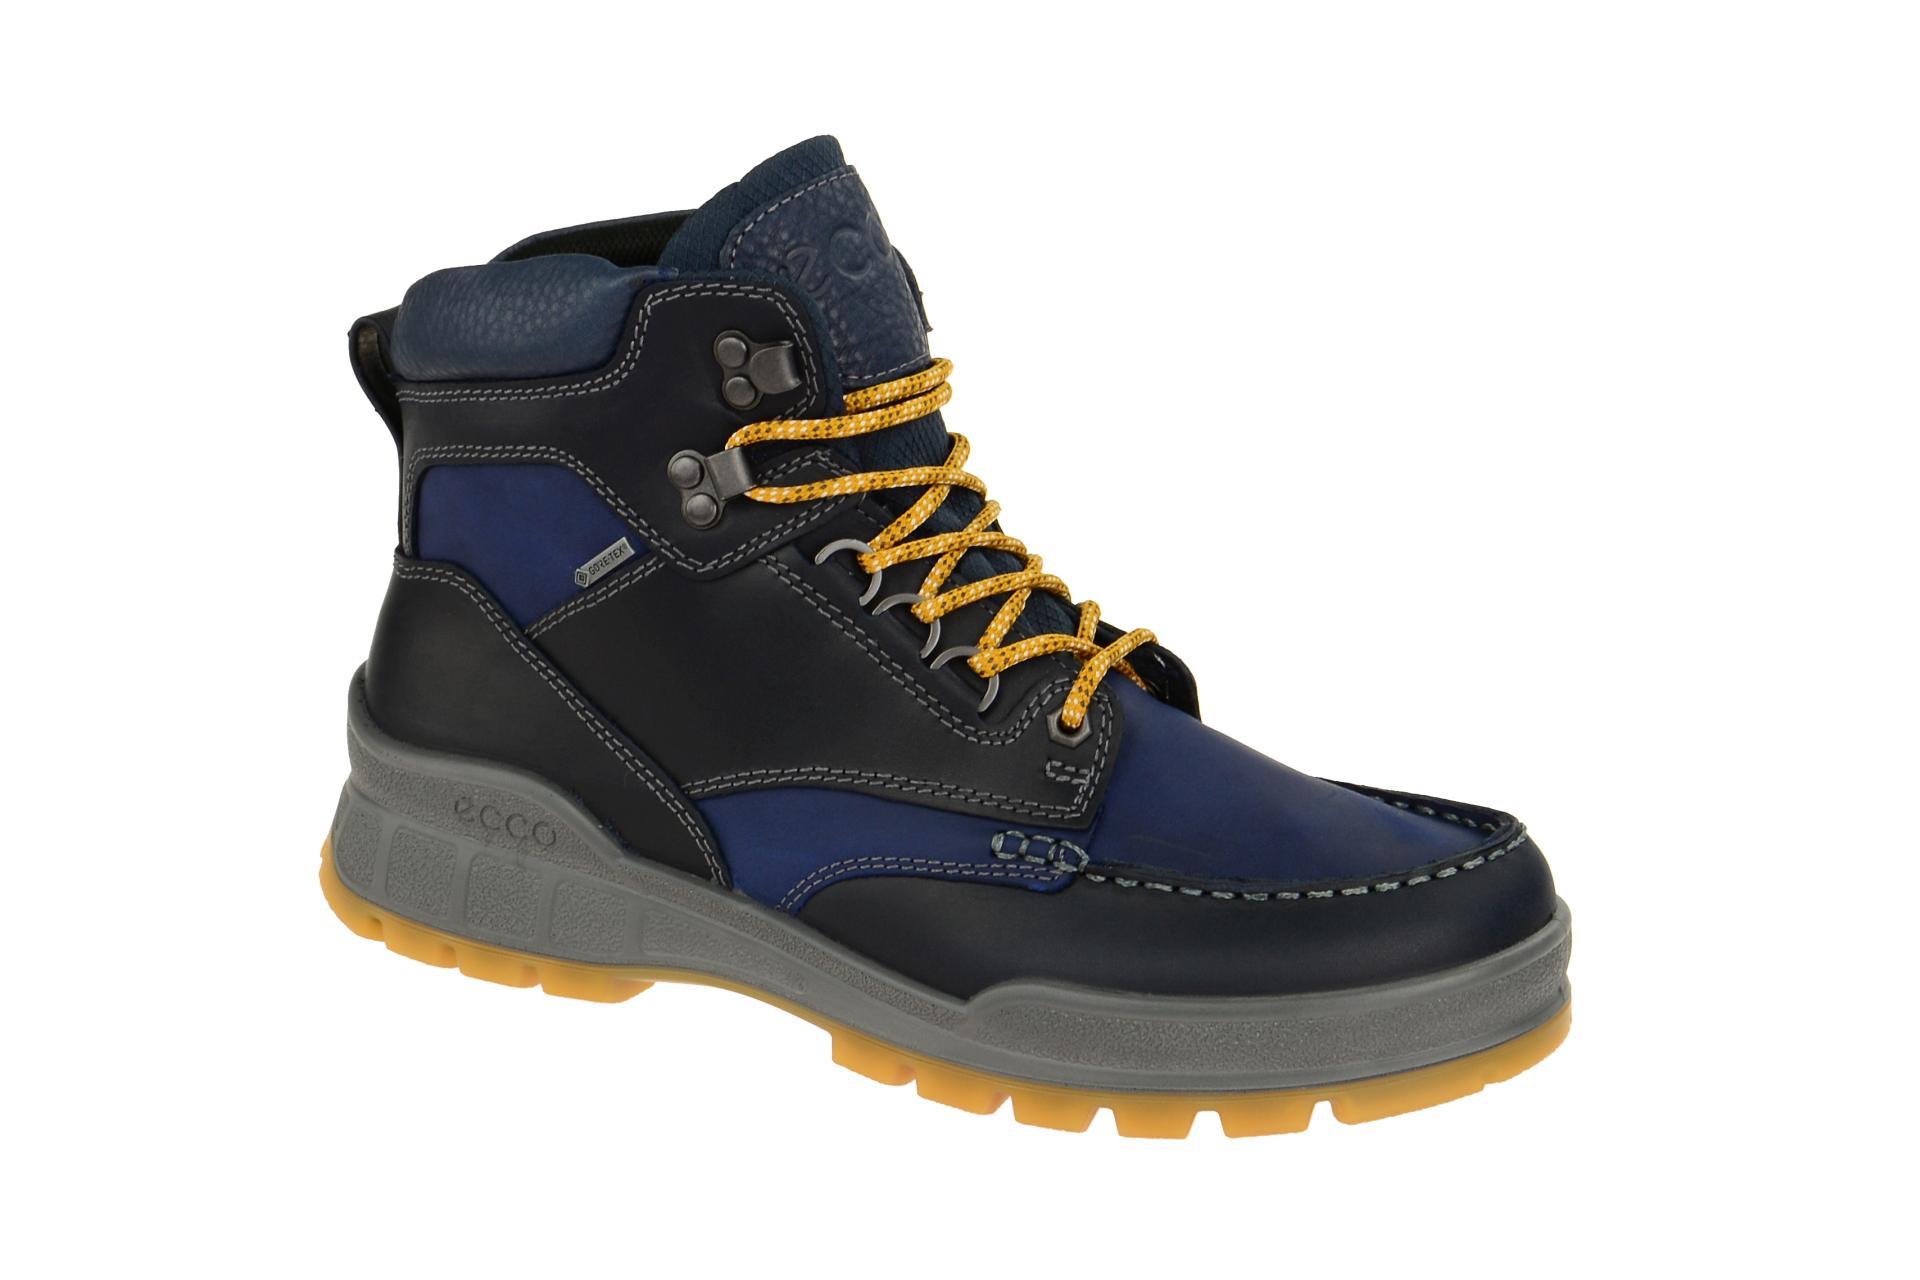 Trekkingschuhe Ecco Track 25 Rold Mid GTX Boots Gore Tex